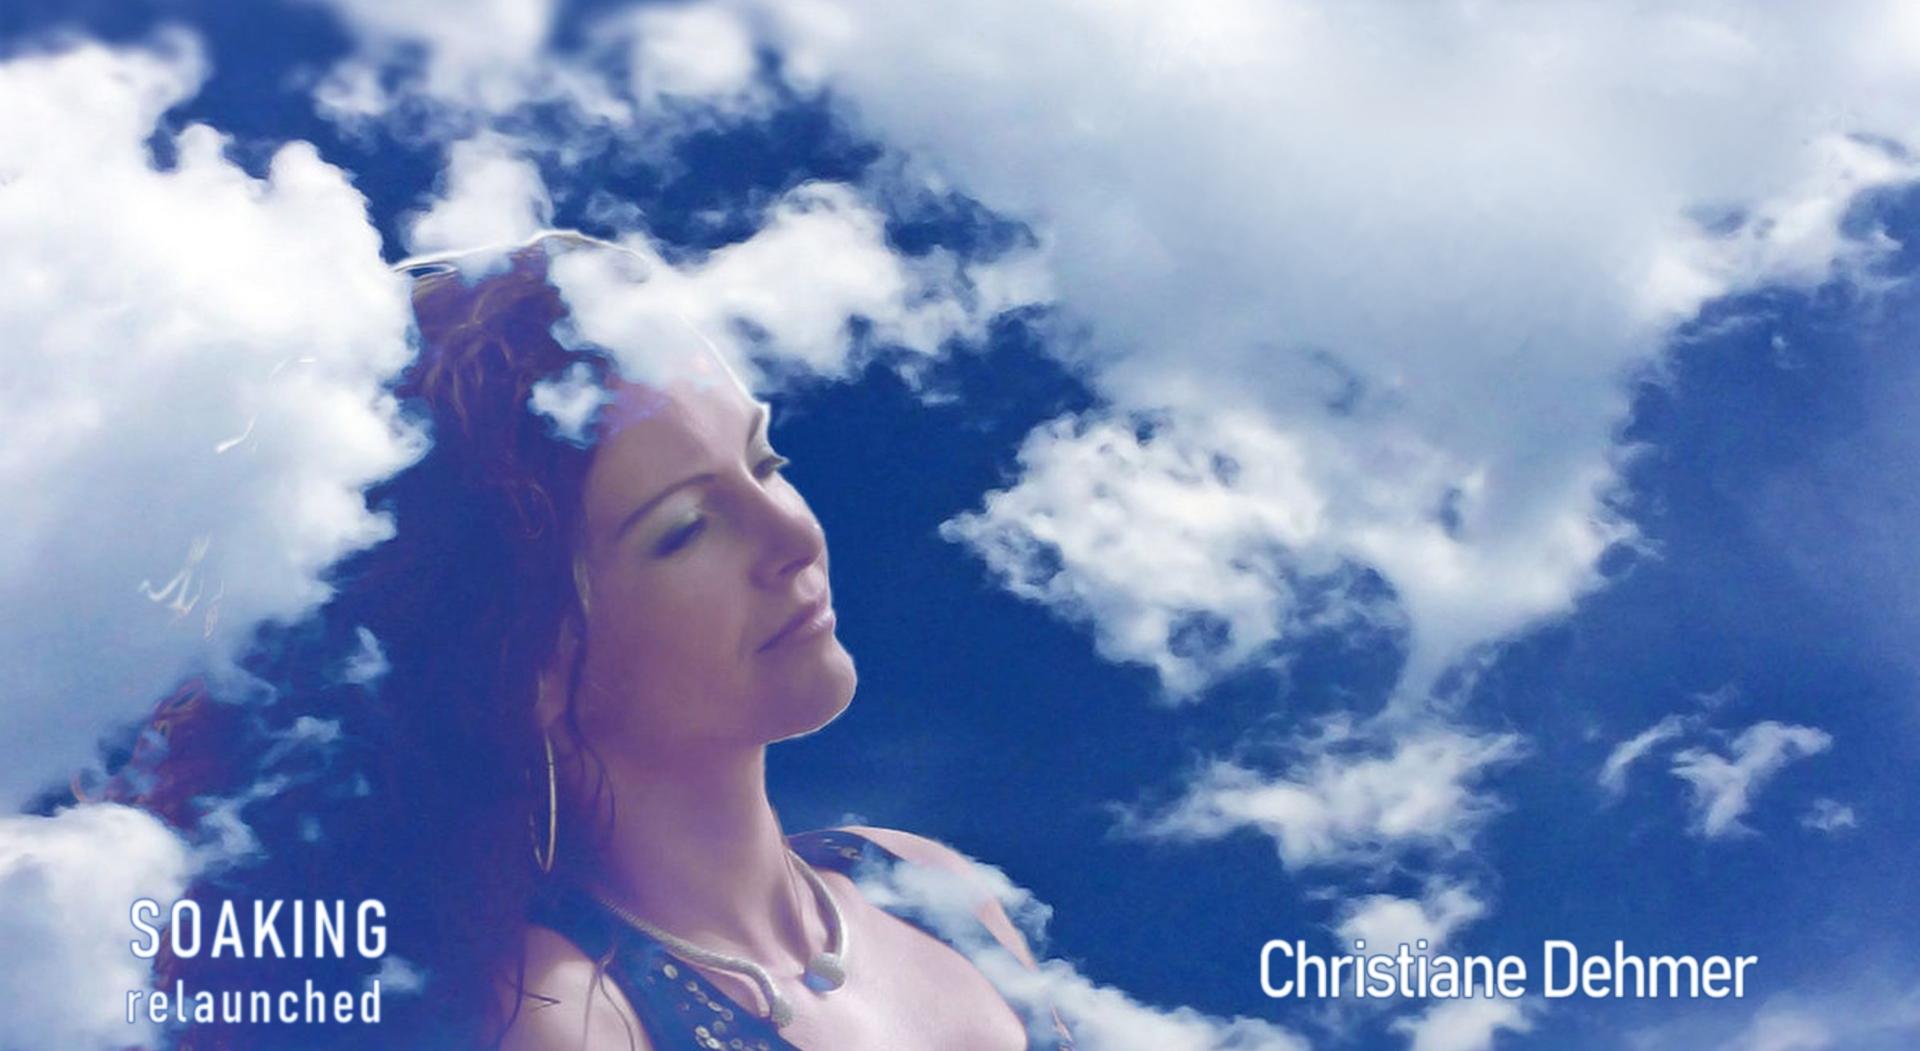 Christiane Dehmer